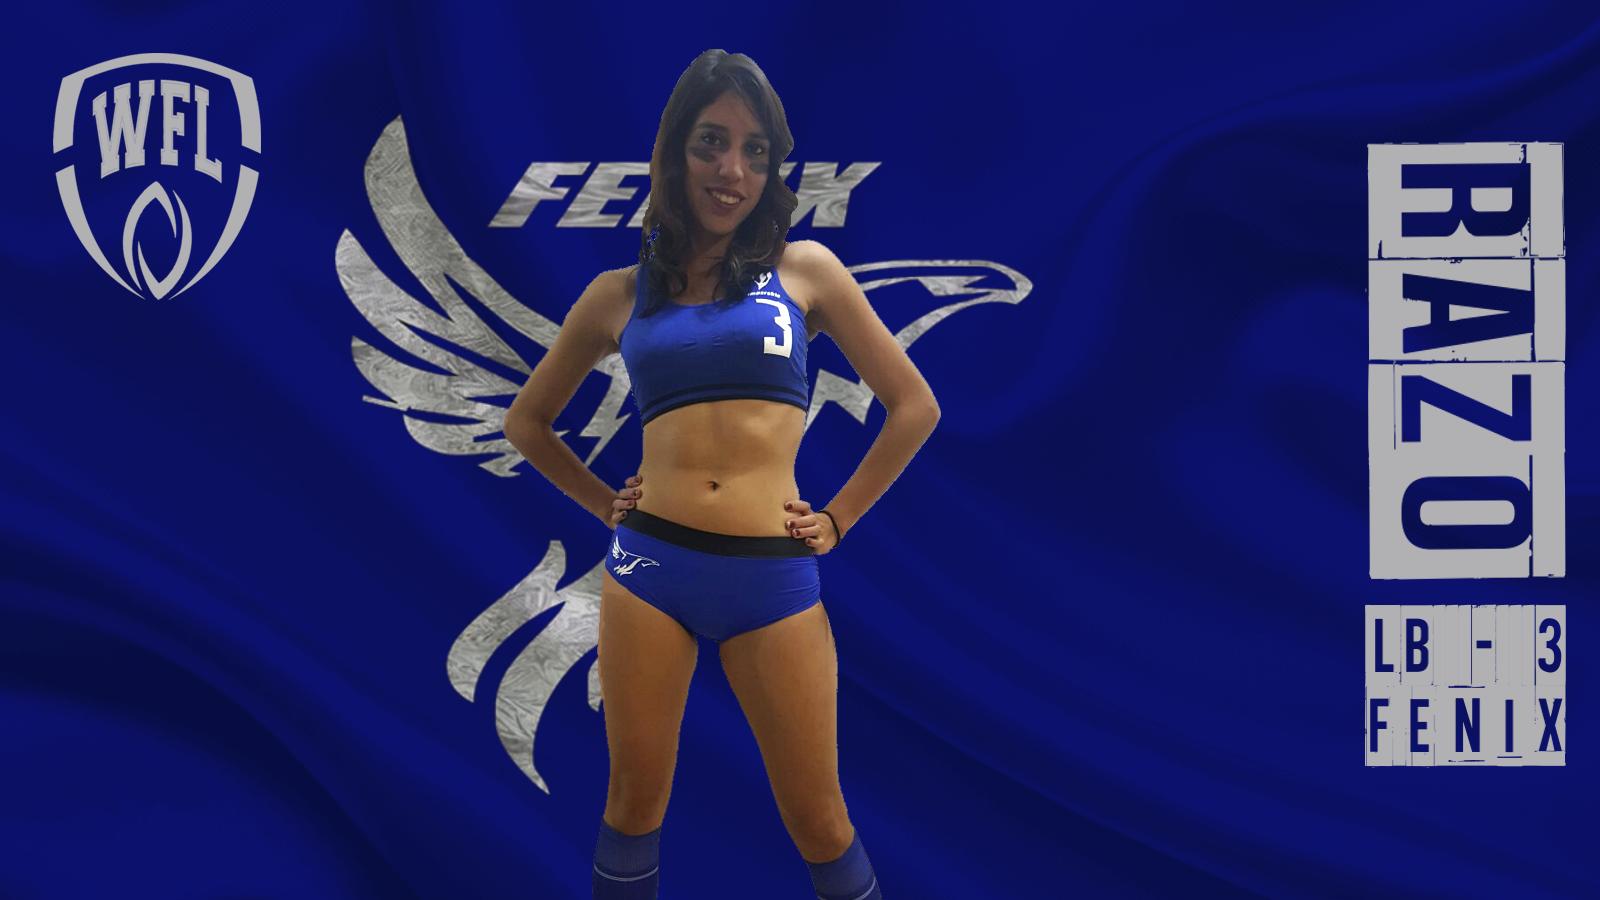 WFL FENIX 03